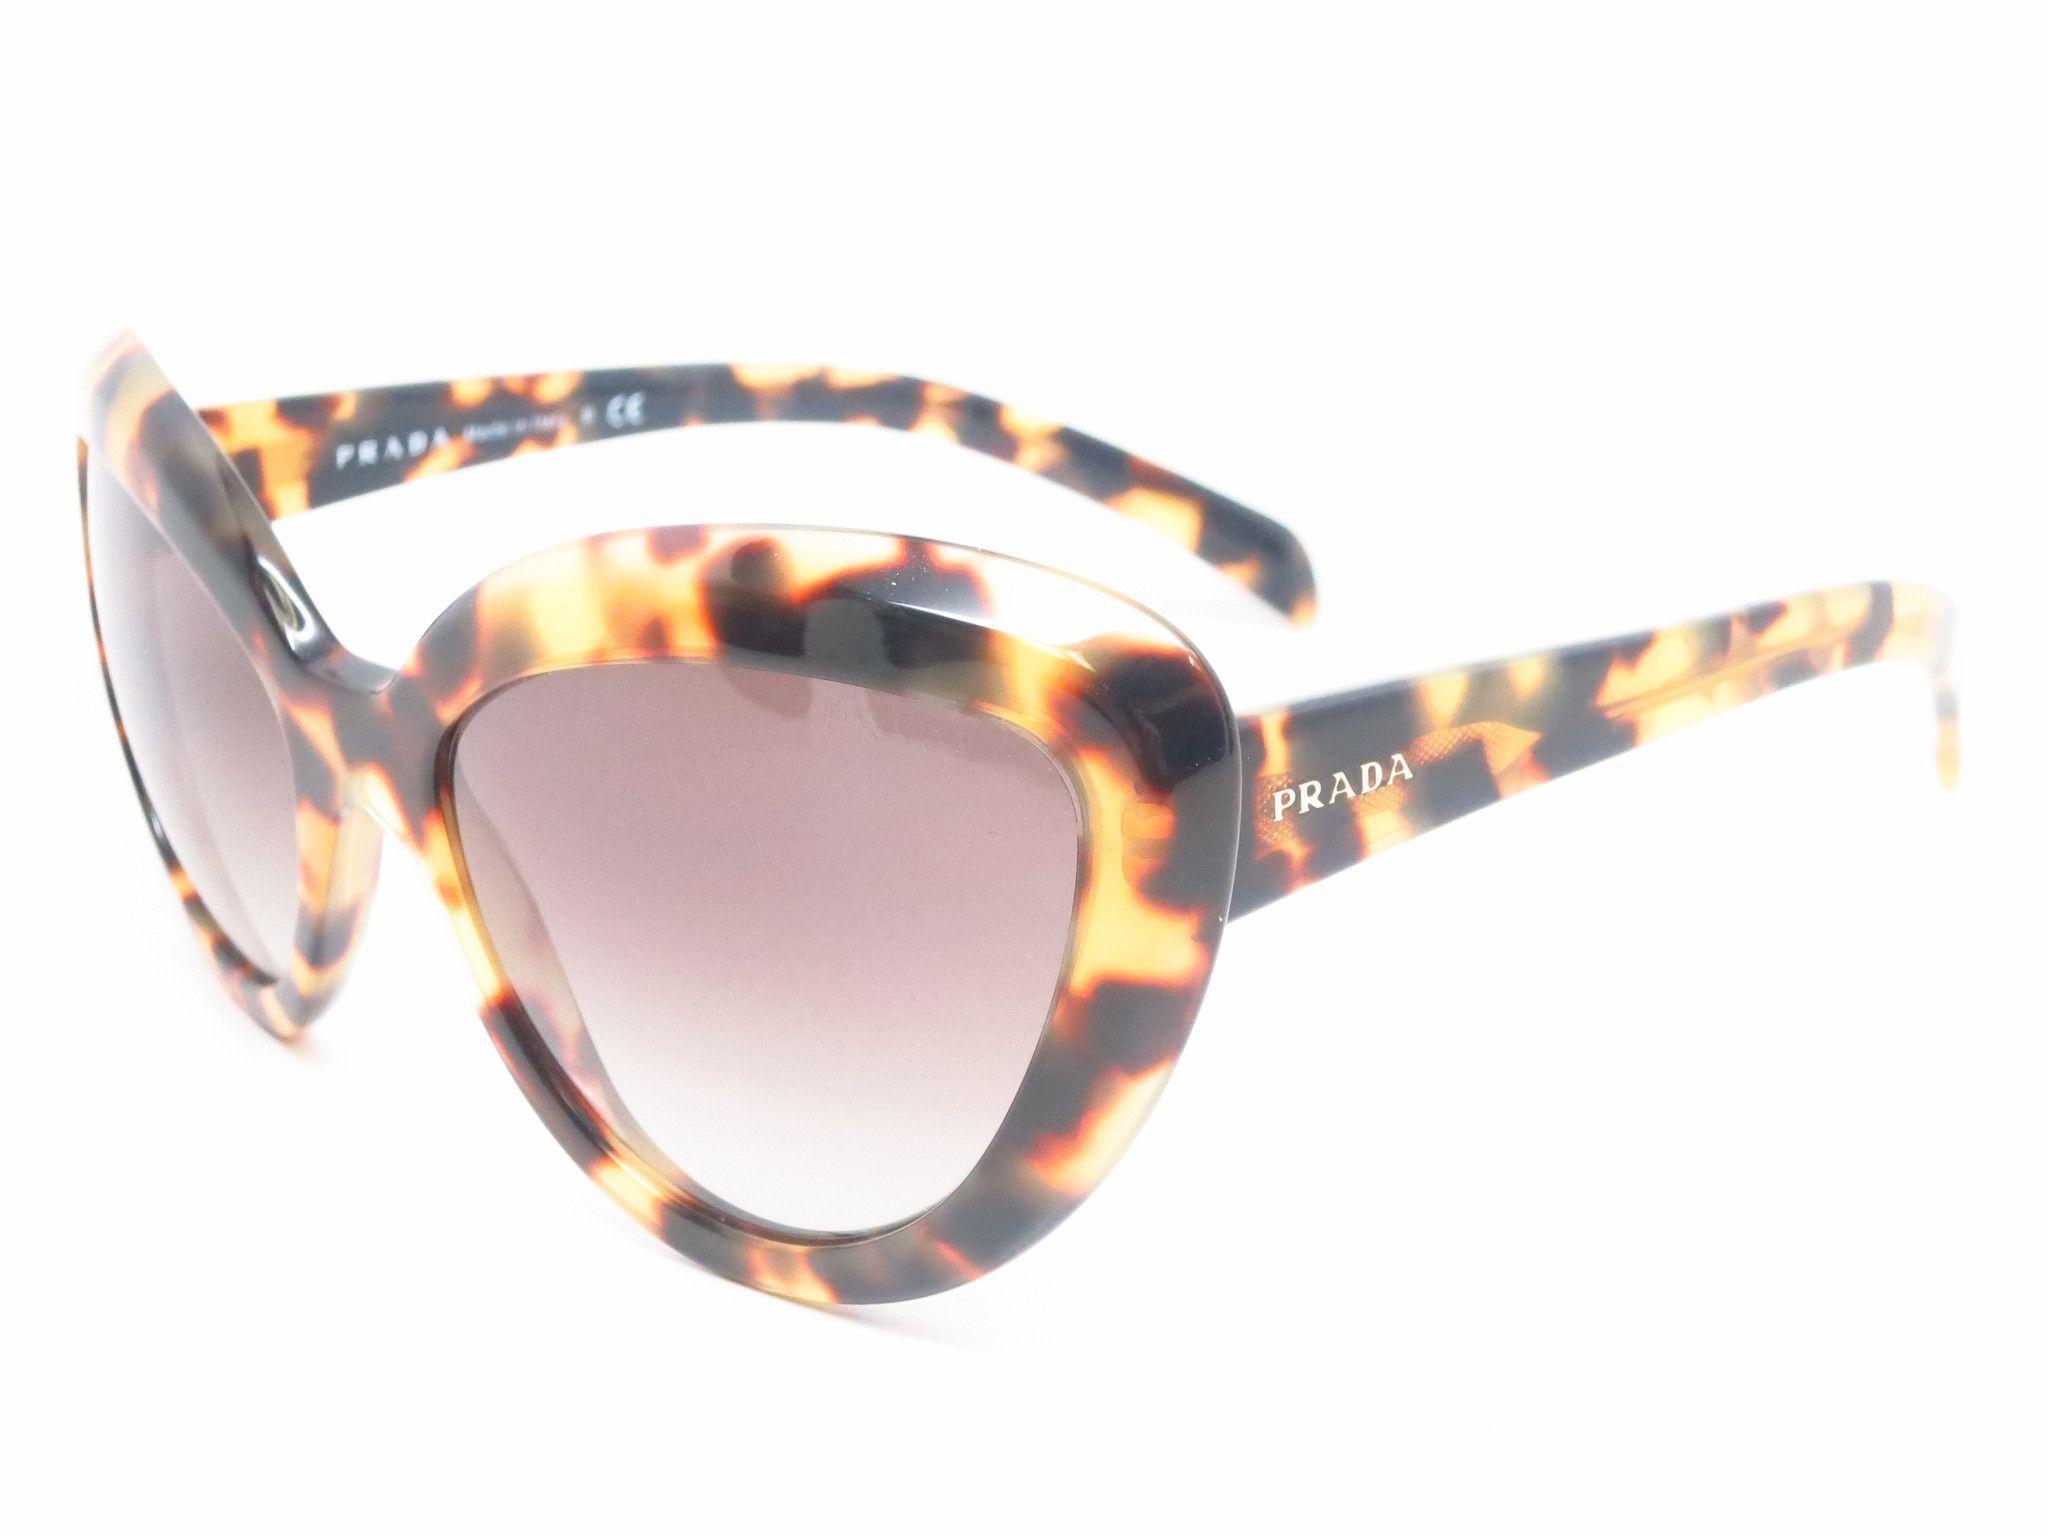 7d6e31d50e Prada SPR 08R 7S0-0A7 Medium Havana Sunglasses | eye candy